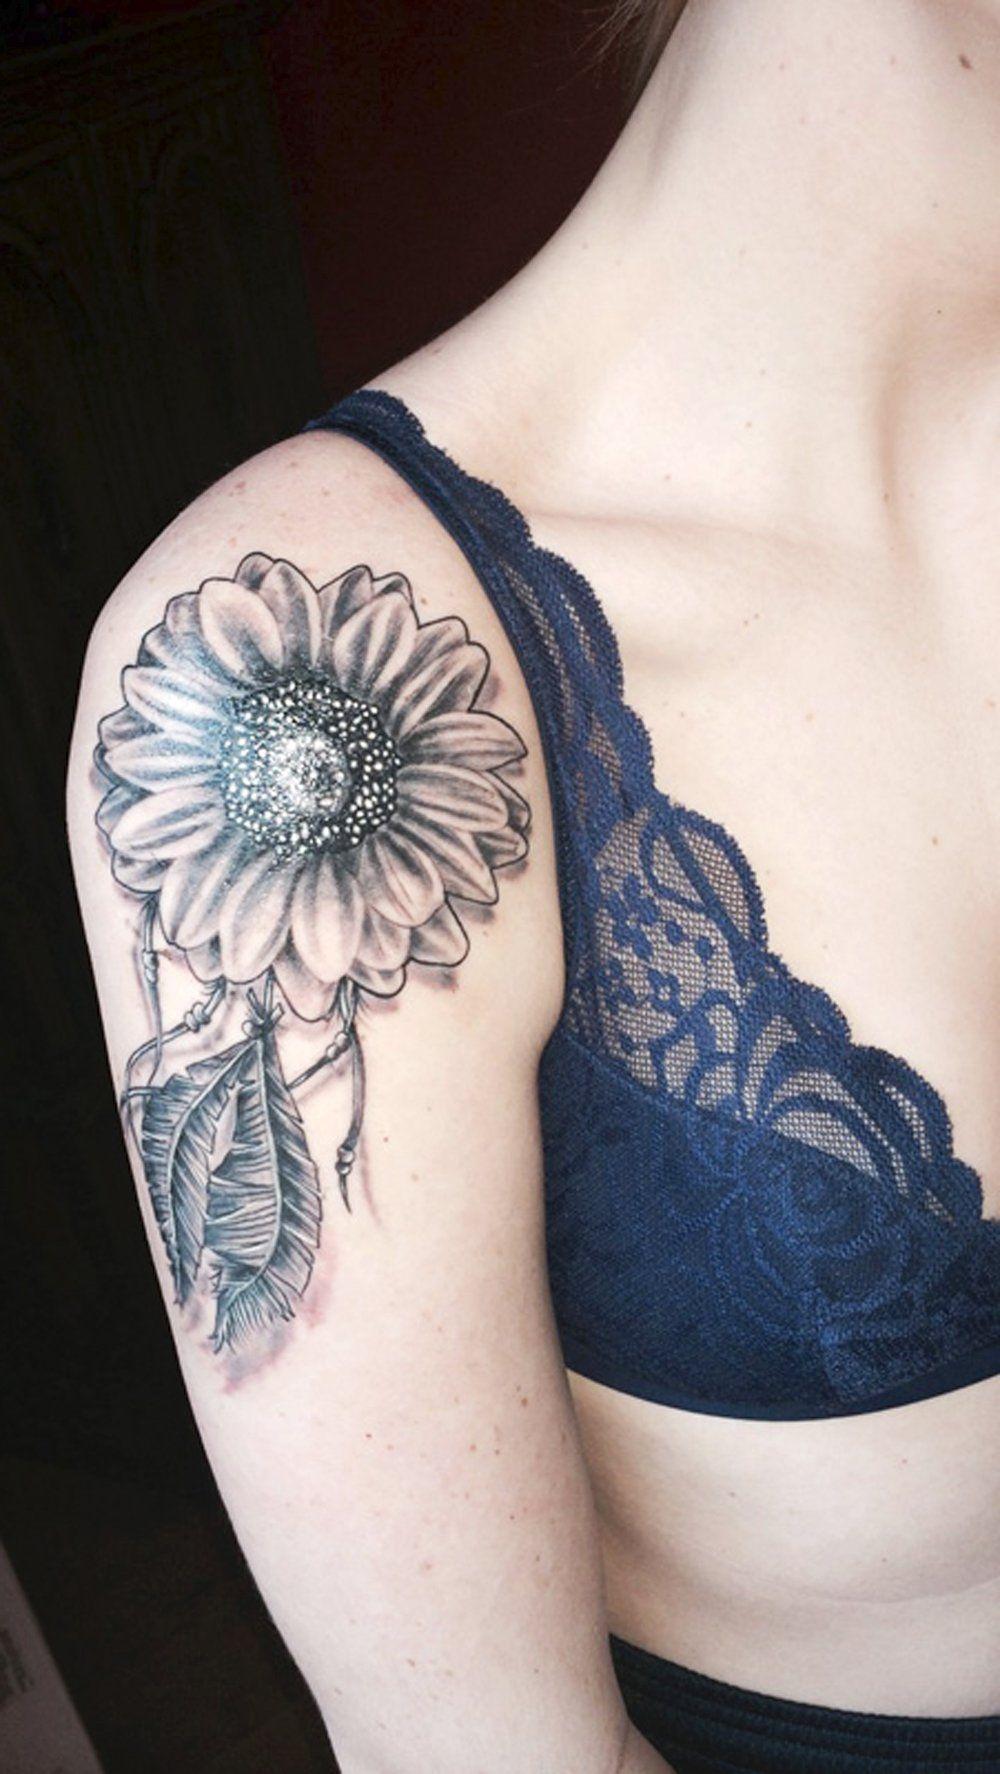 Sunflower Henna Tattoo: Realistic Sunflower Arm Shoulder Tattoo Ideas For Women